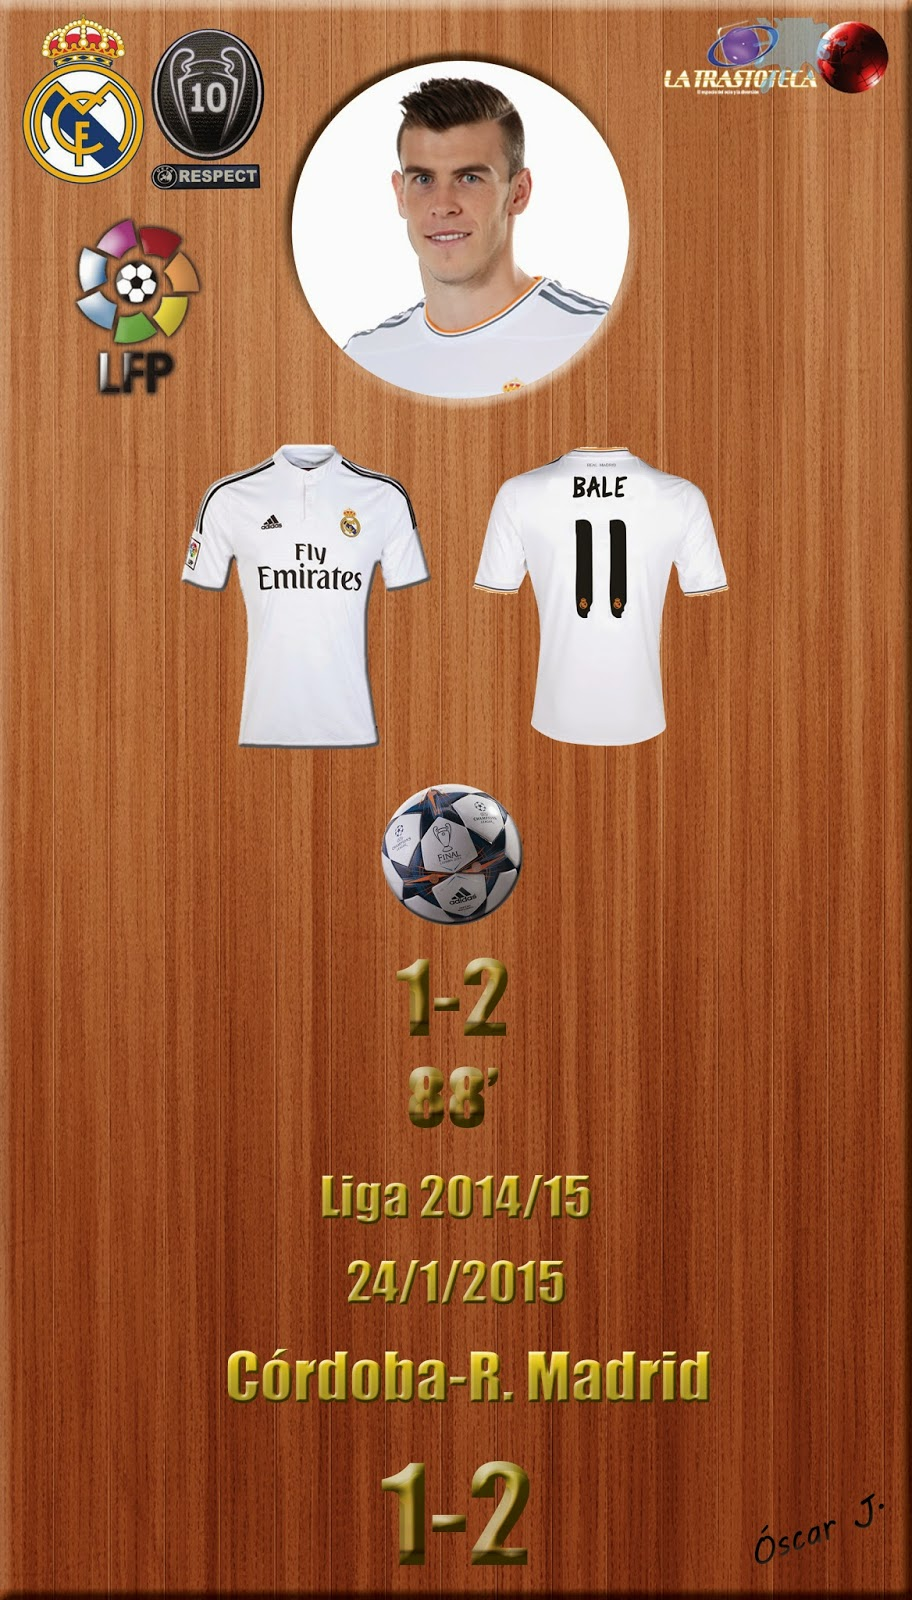 Gareth Bale (1-2) - Córdoba 1-2 Real Madrid - Liga 2014/15 - Jornada 20 - (24/1/2015)